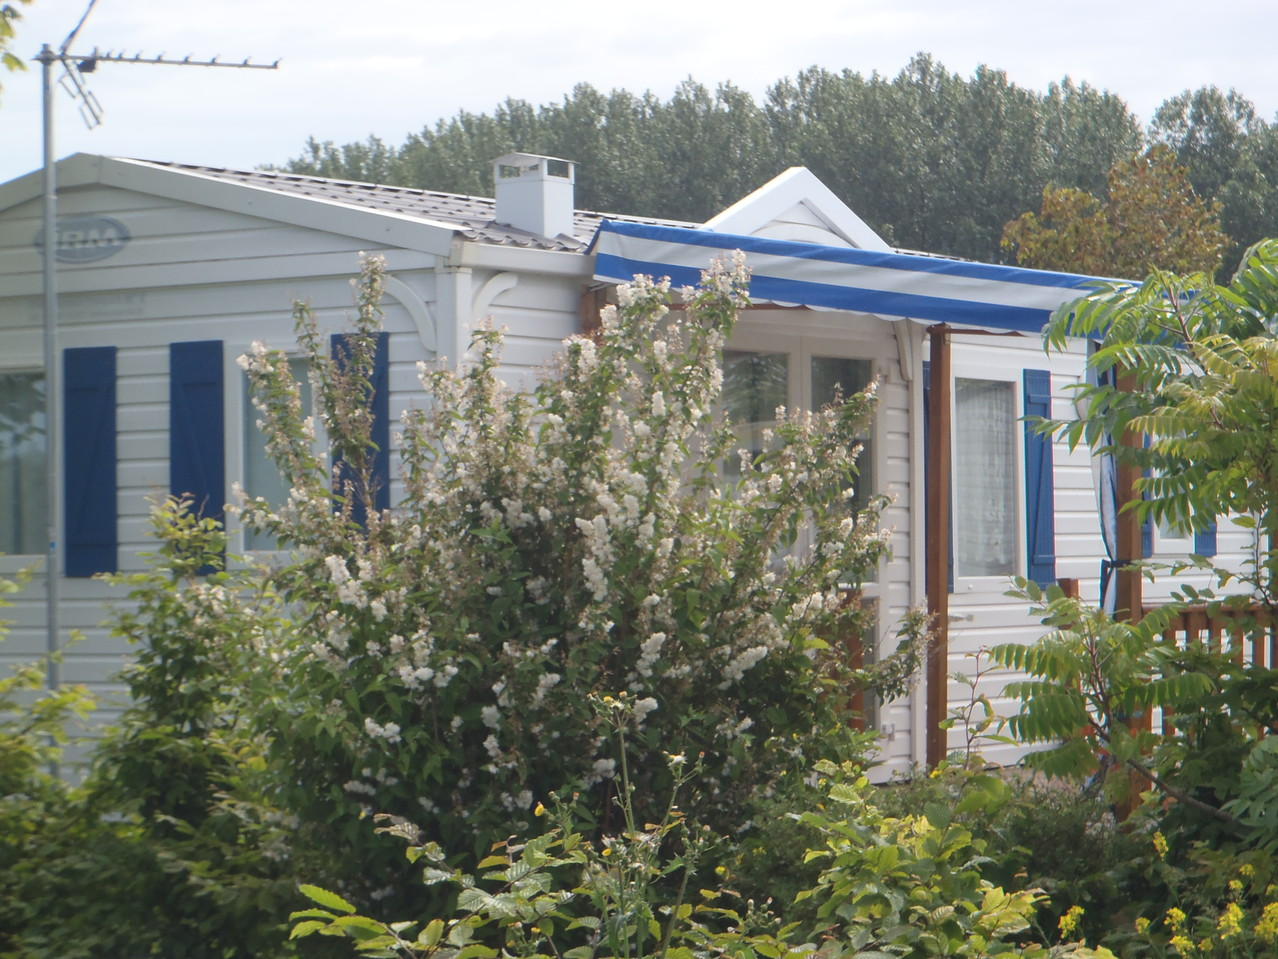 camping oiseaux baie somme picardie vente mobil home crotoy rue